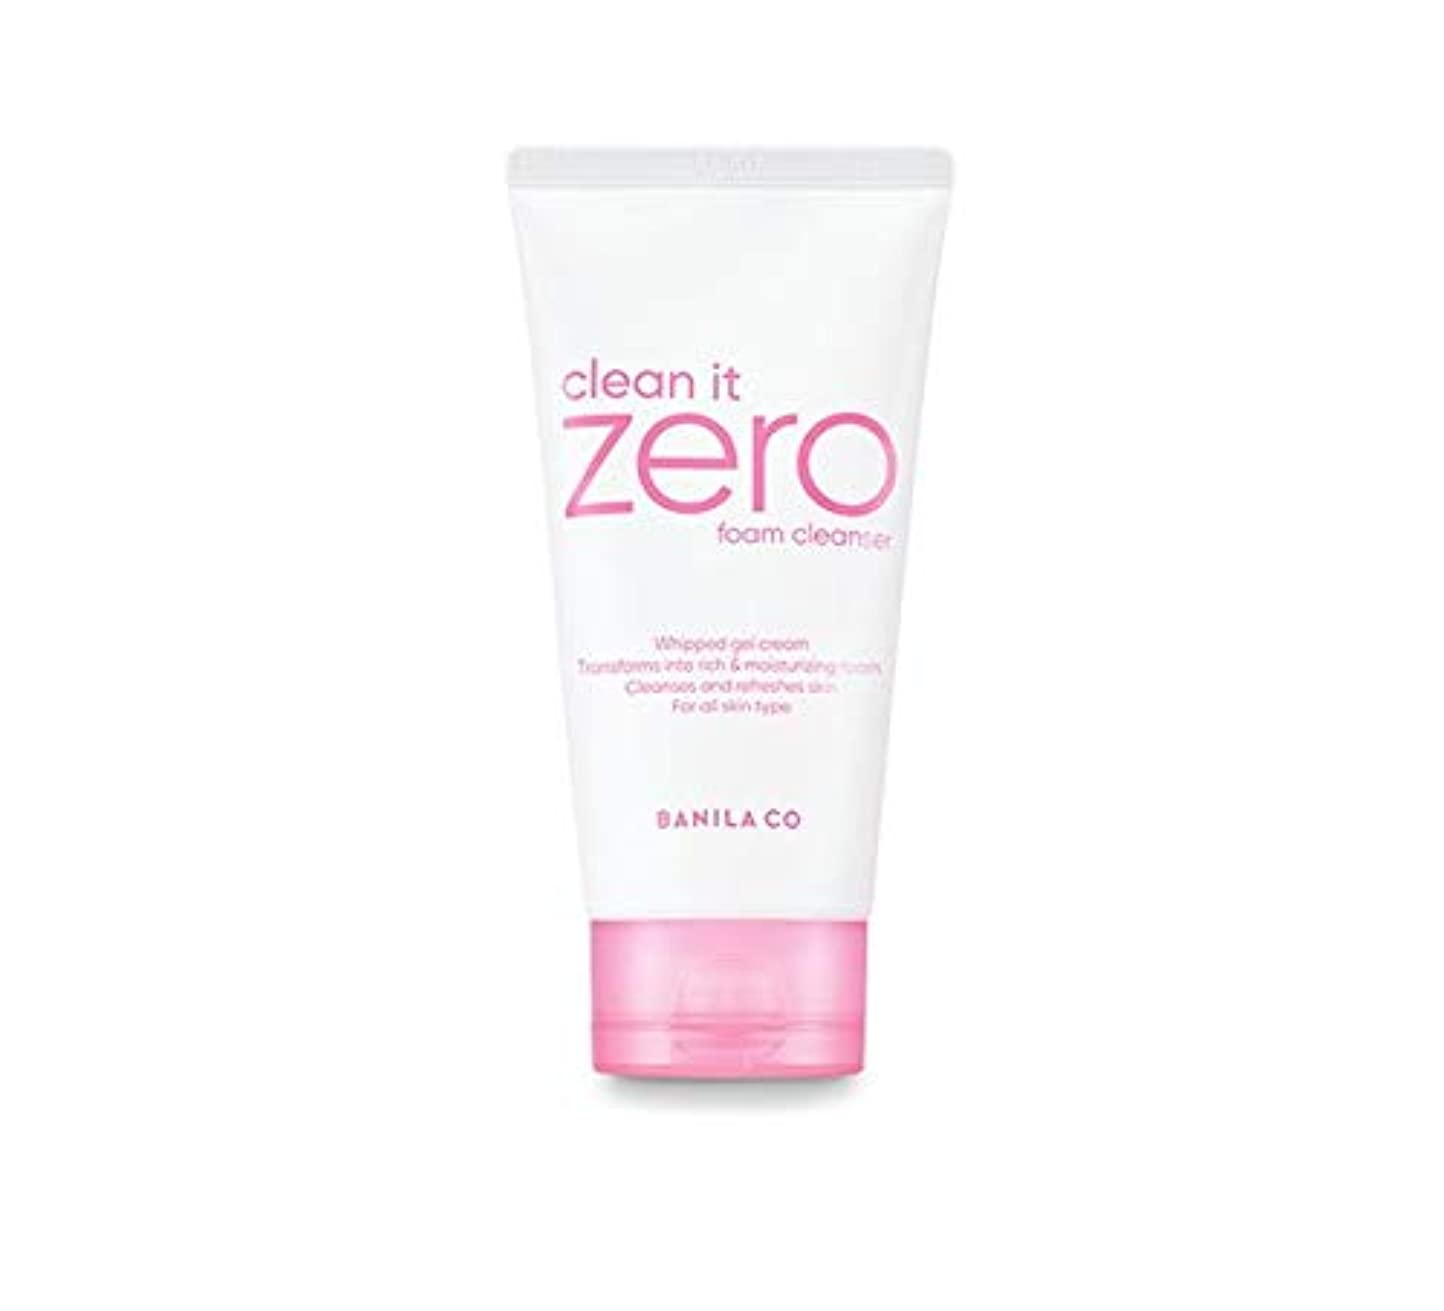 banilaco クリーンイットゼロフォームクレンザー/Clean It Zero Foam Cleanser 150ml [並行輸入品]